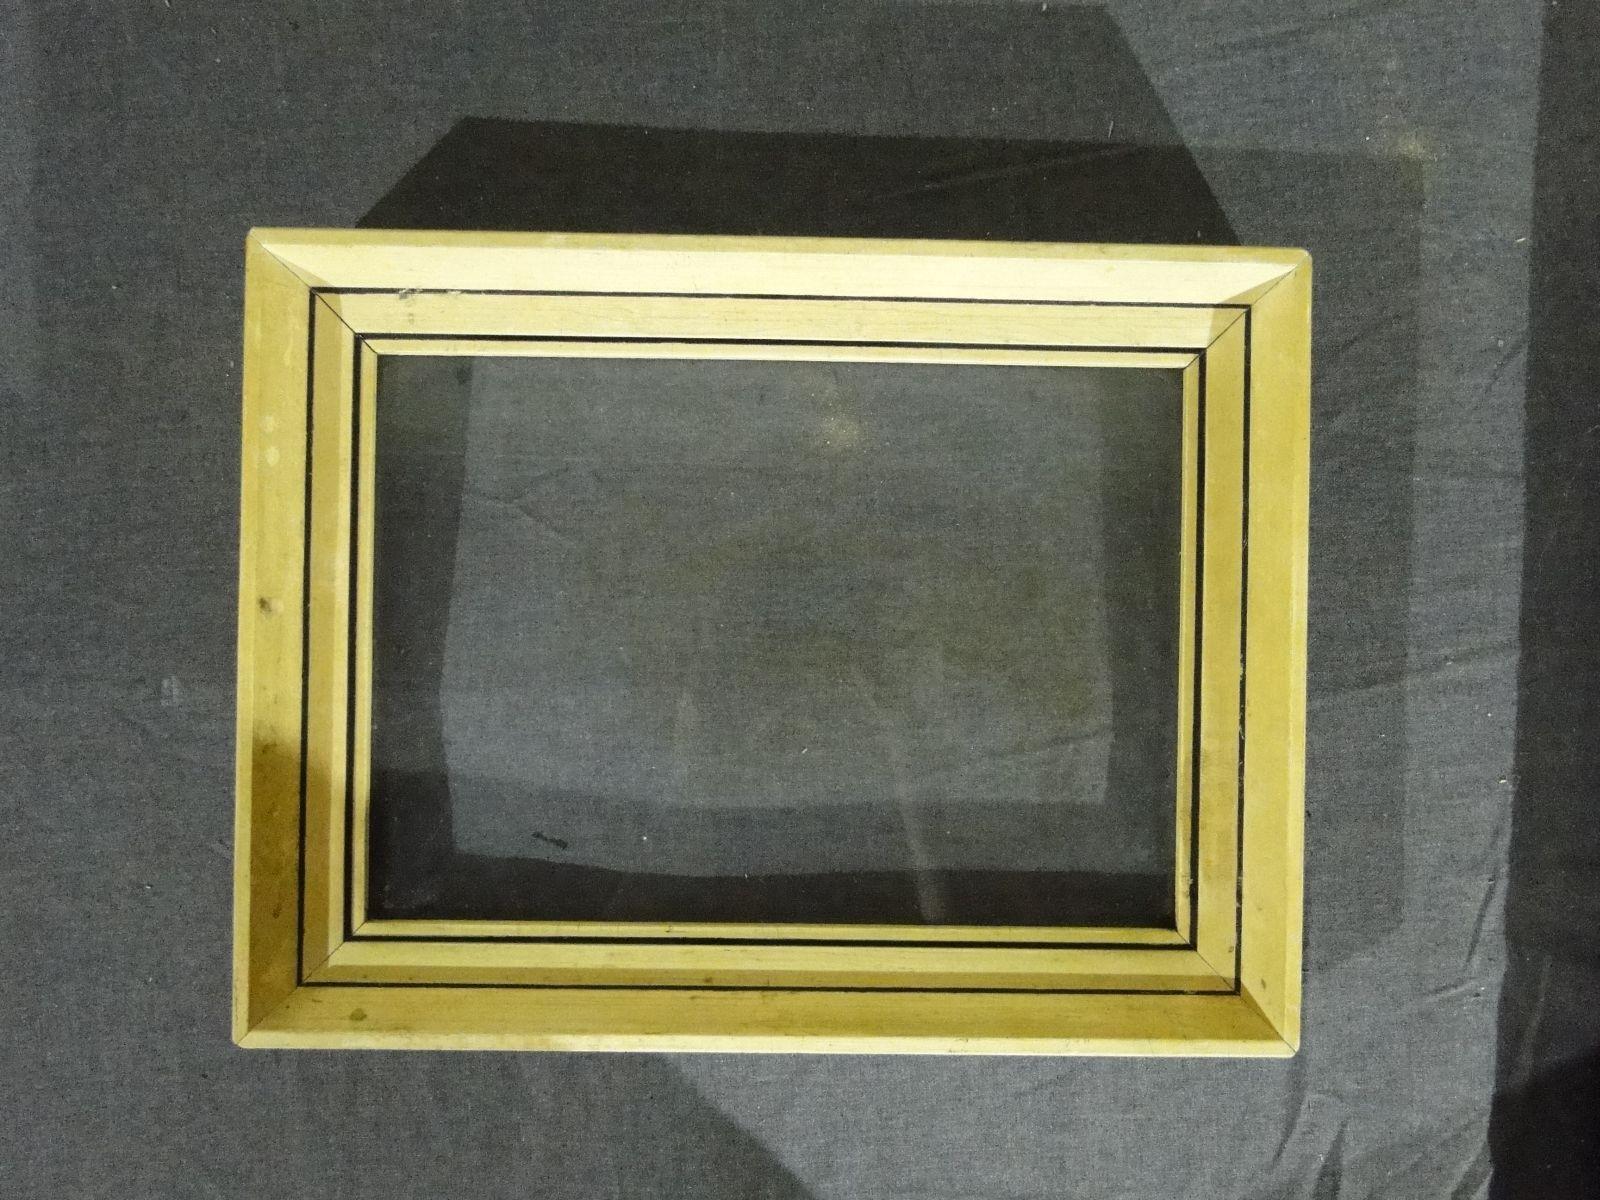 DSC01352.JPG (1600×1200)